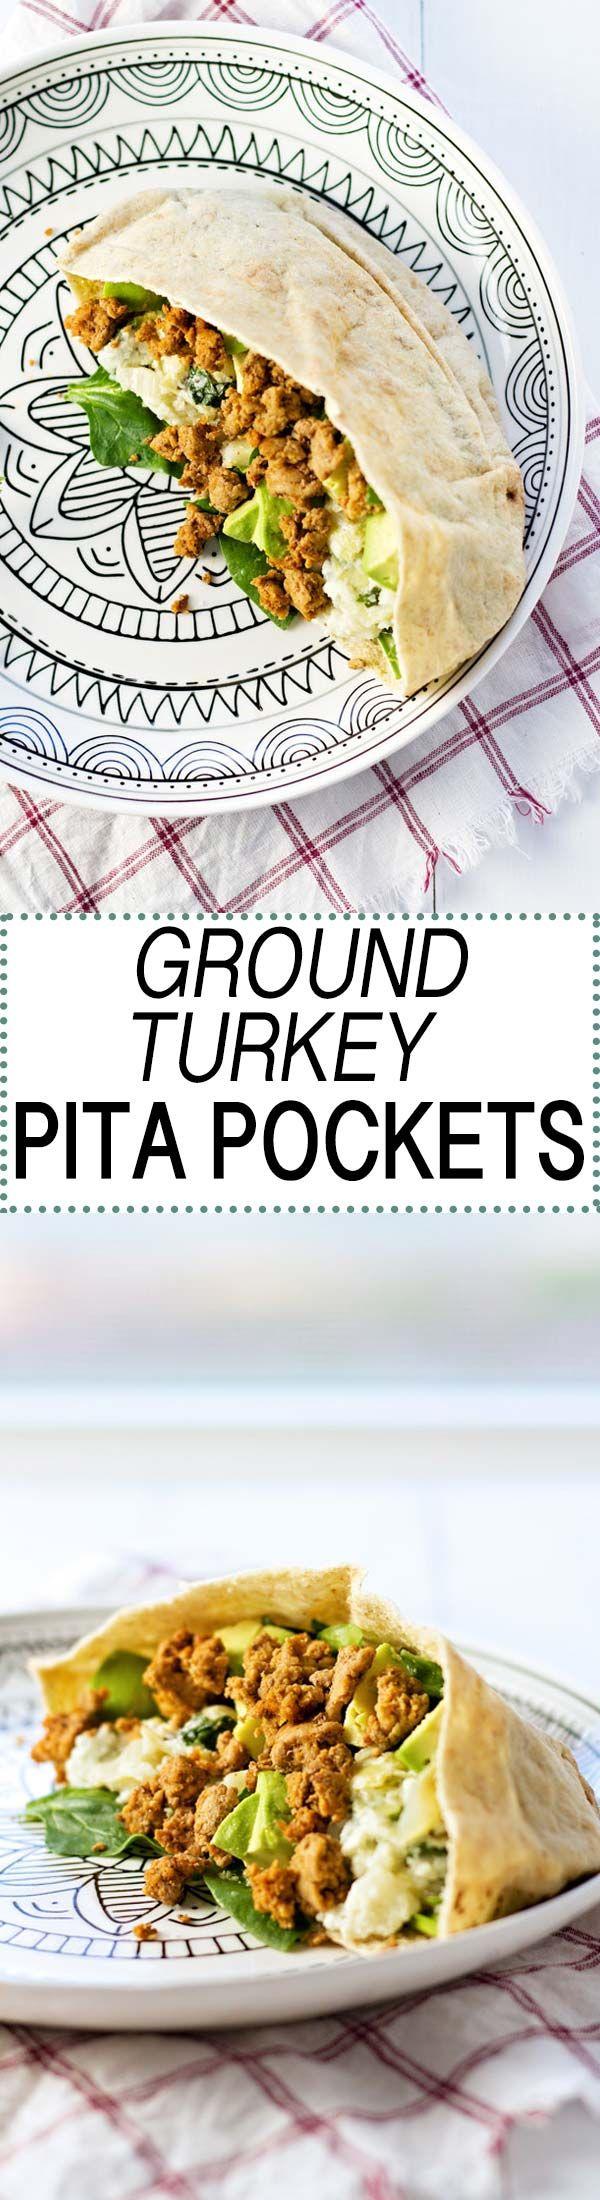 Ground Turkey Pita Pockets stuffed with spinach, avocado, and spinach artichoke dip!